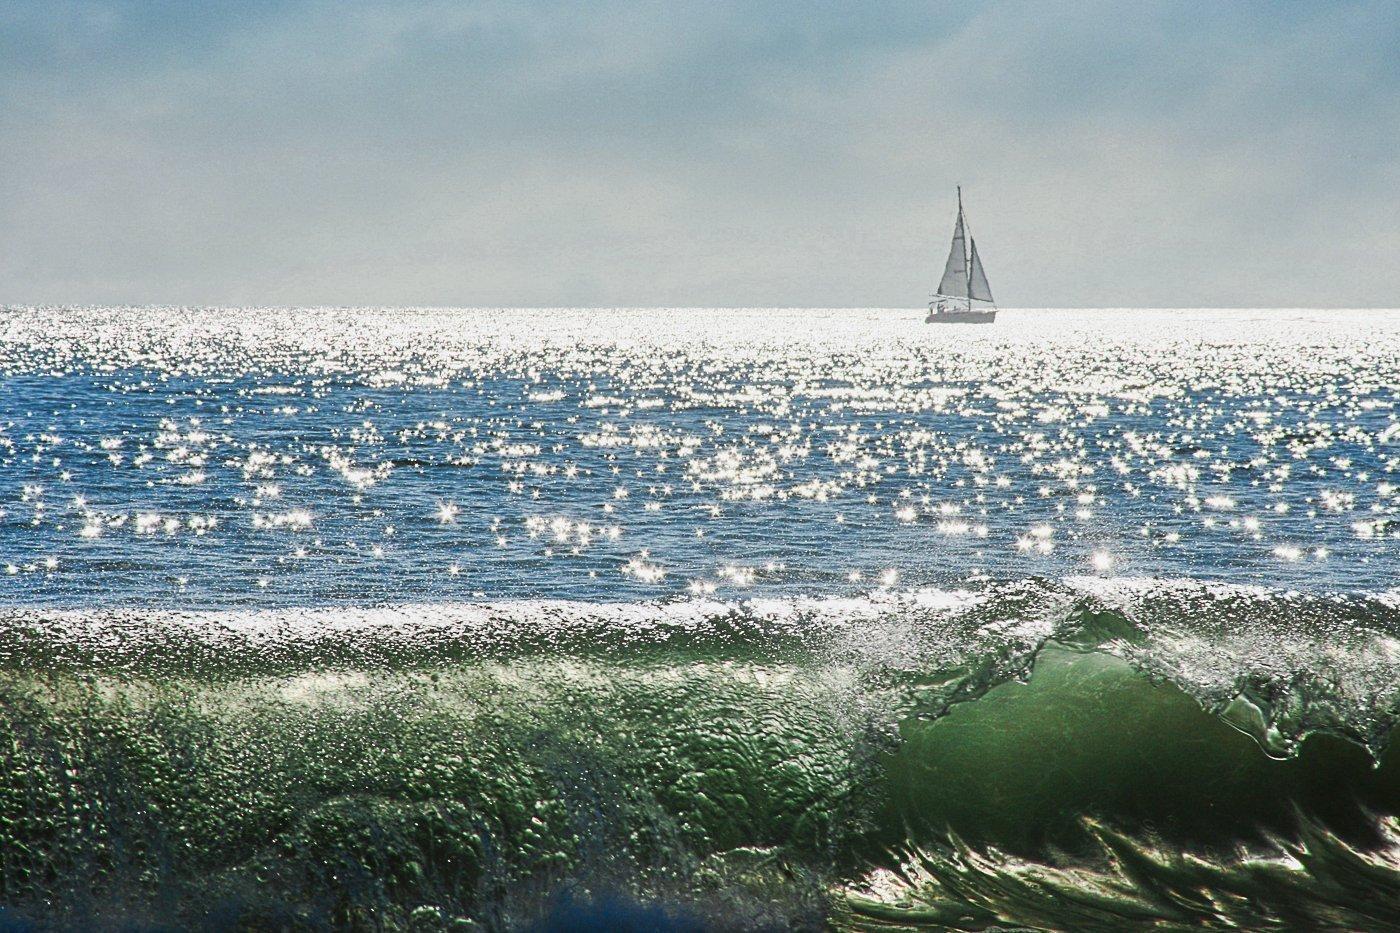 Starry Ocean - Santa Cruz, California